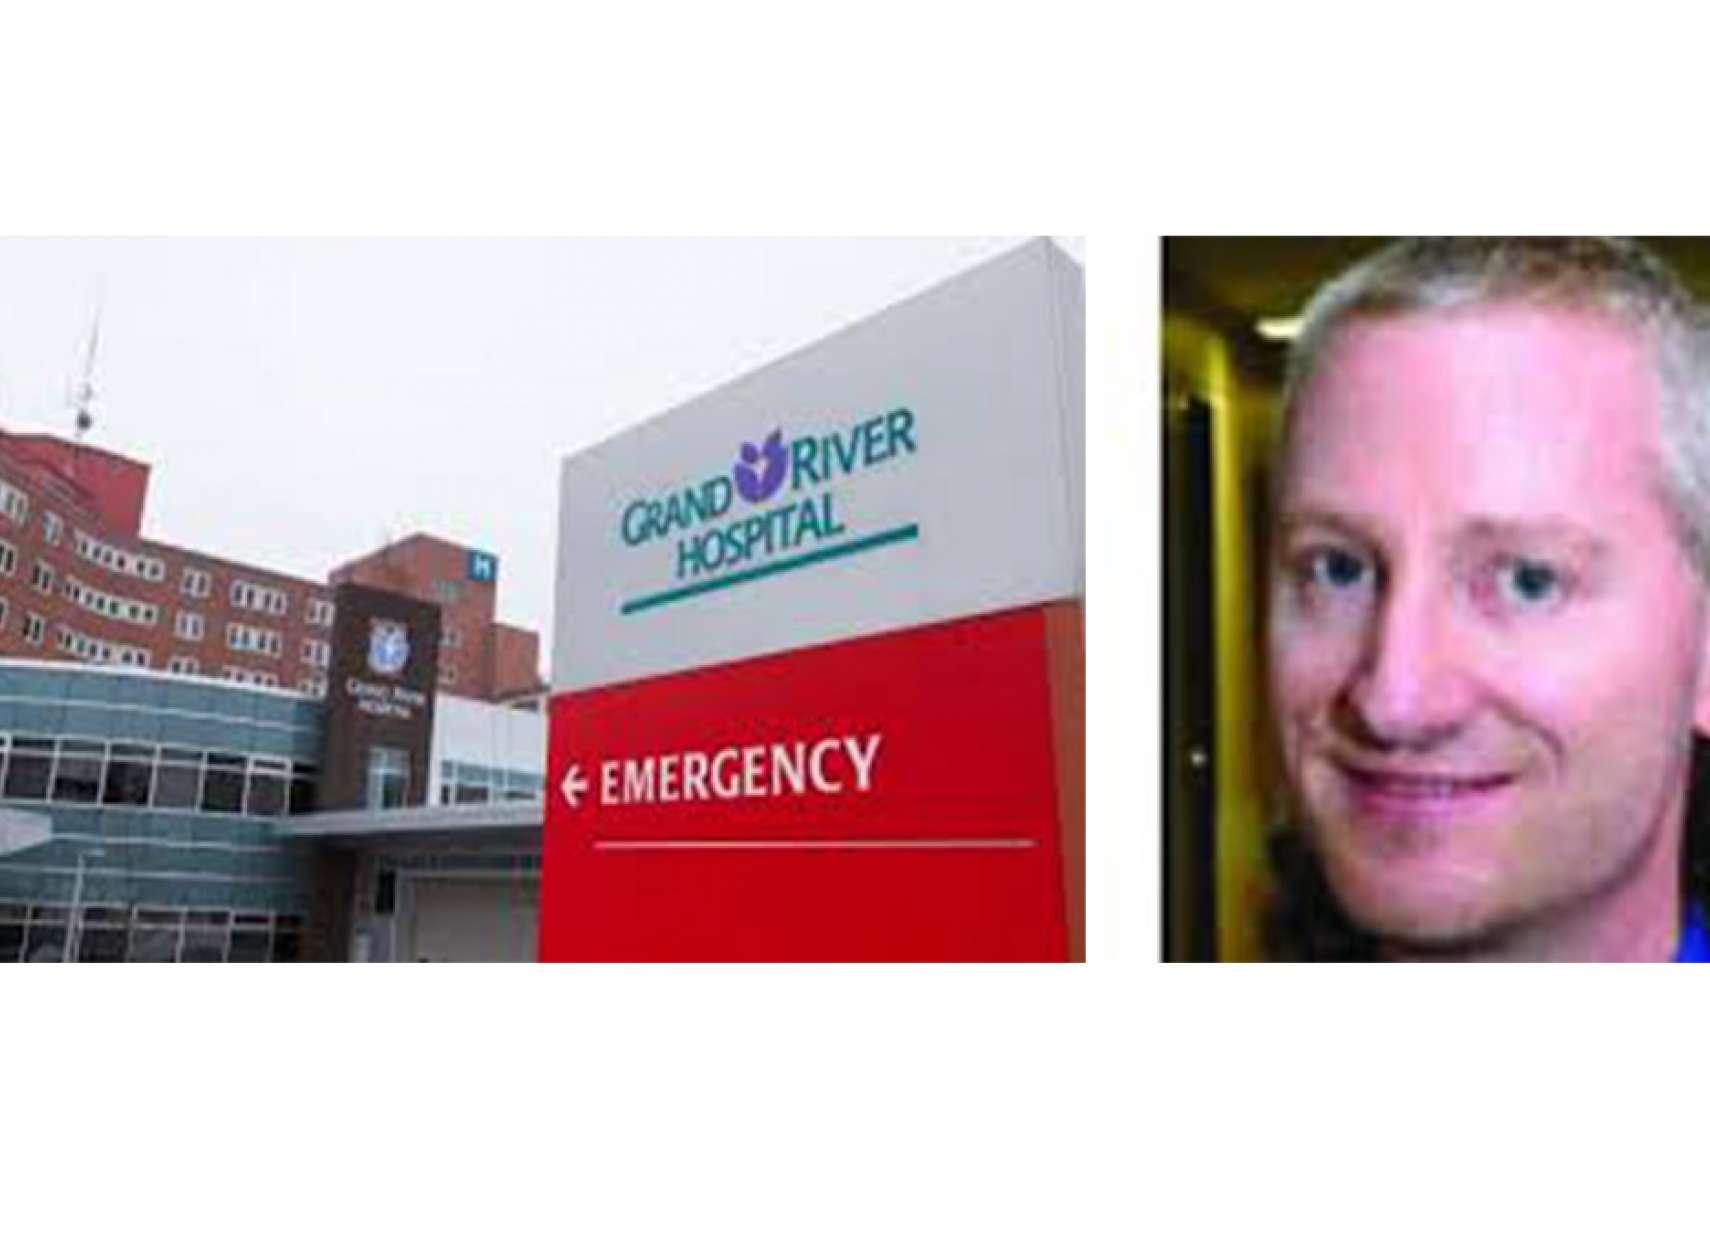 اخبار-تورنتو-متخصص-اعصاب-متهم-به-34-مورد-تجاوز-شد